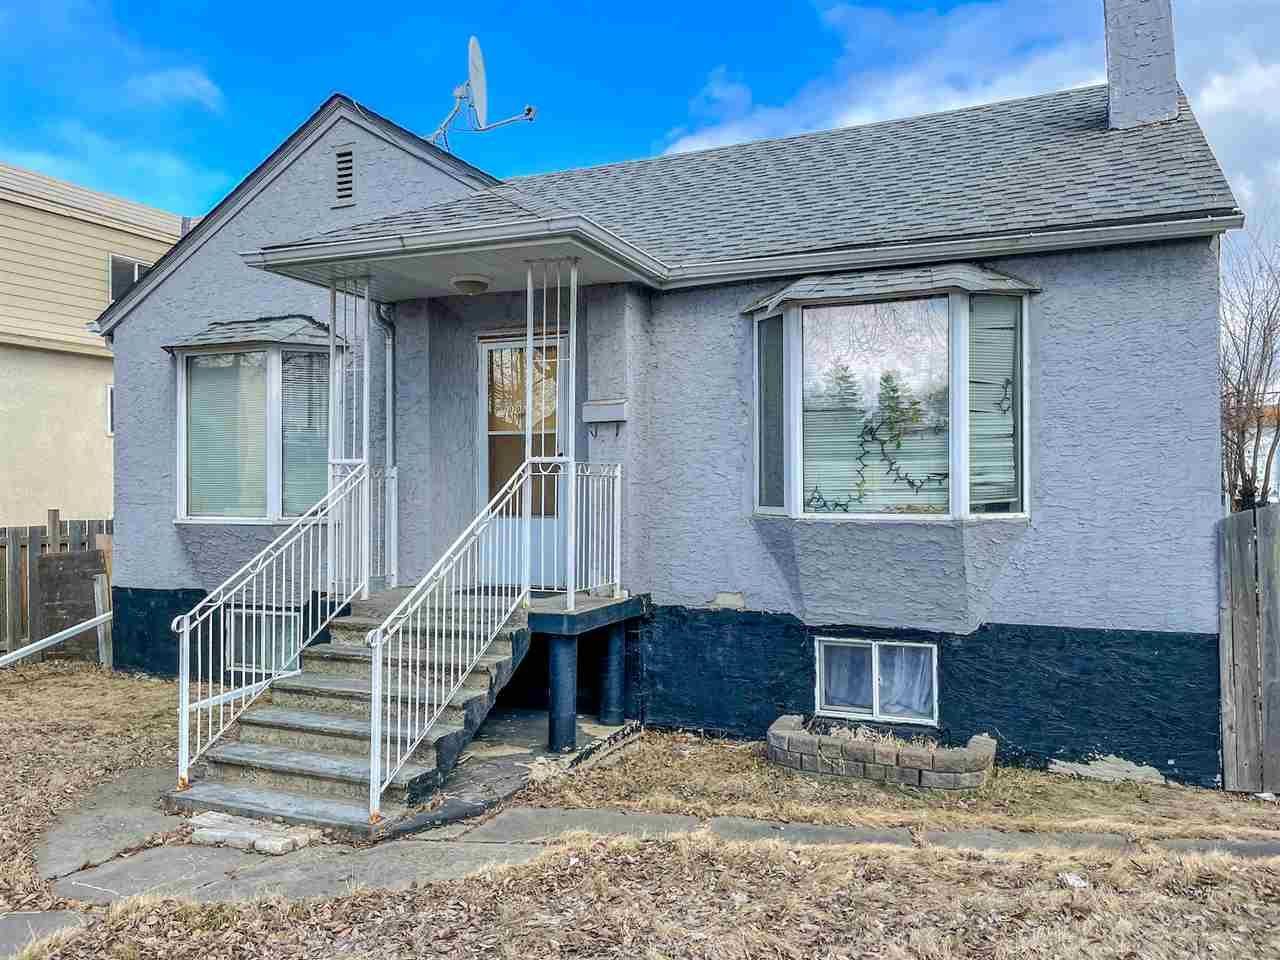 Main Photo: 10709 112 Street in Edmonton: Zone 08 House for sale : MLS®# E4238886